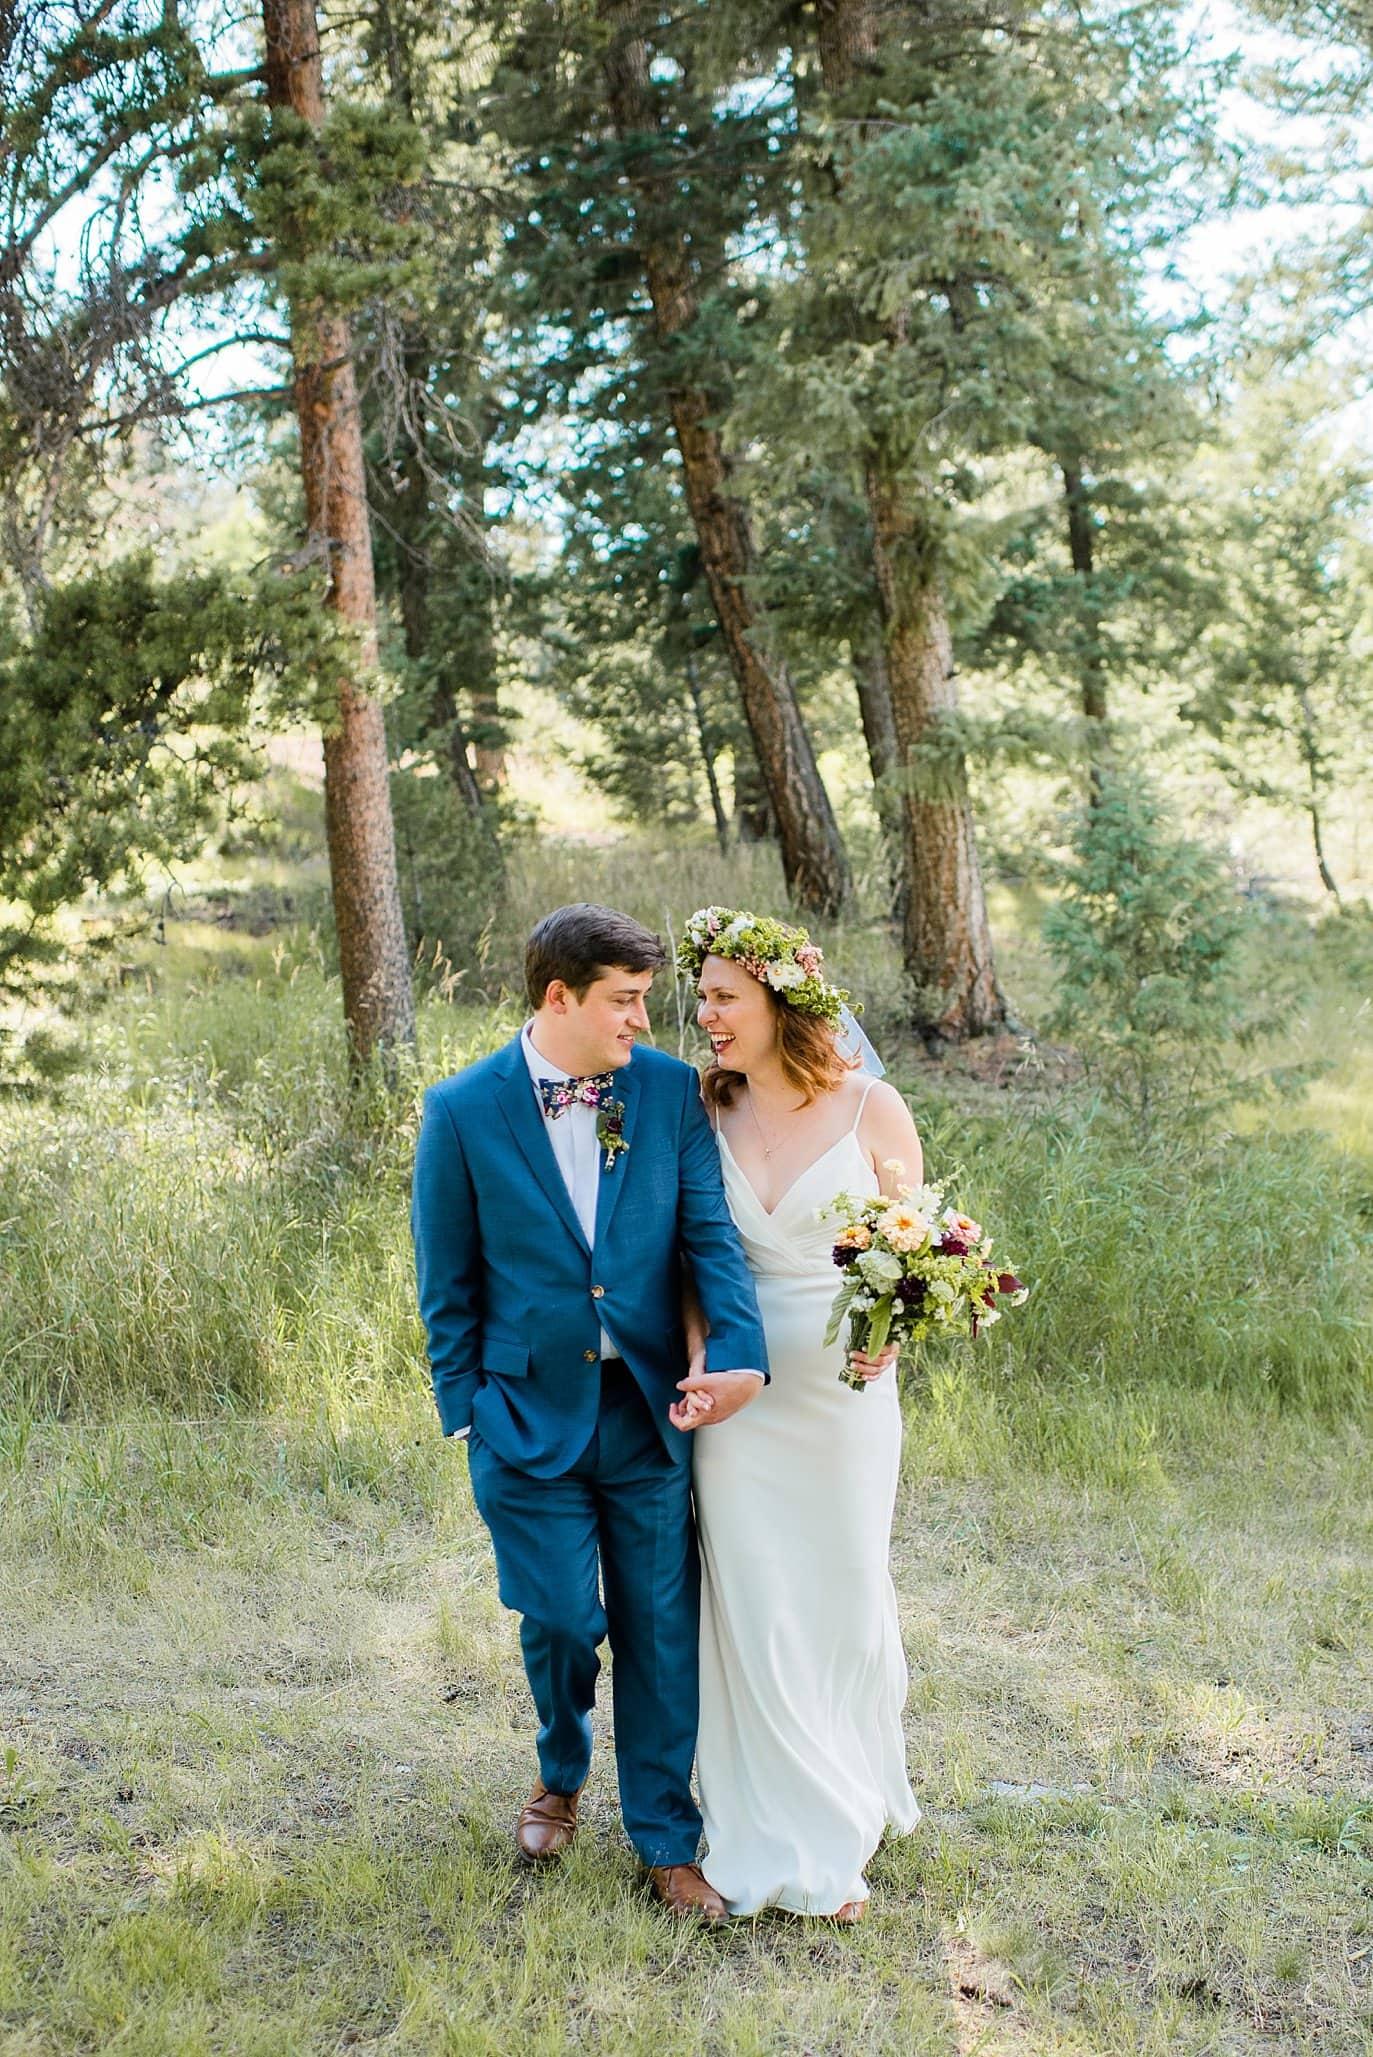 wildflower wedding inspiration wedding photo